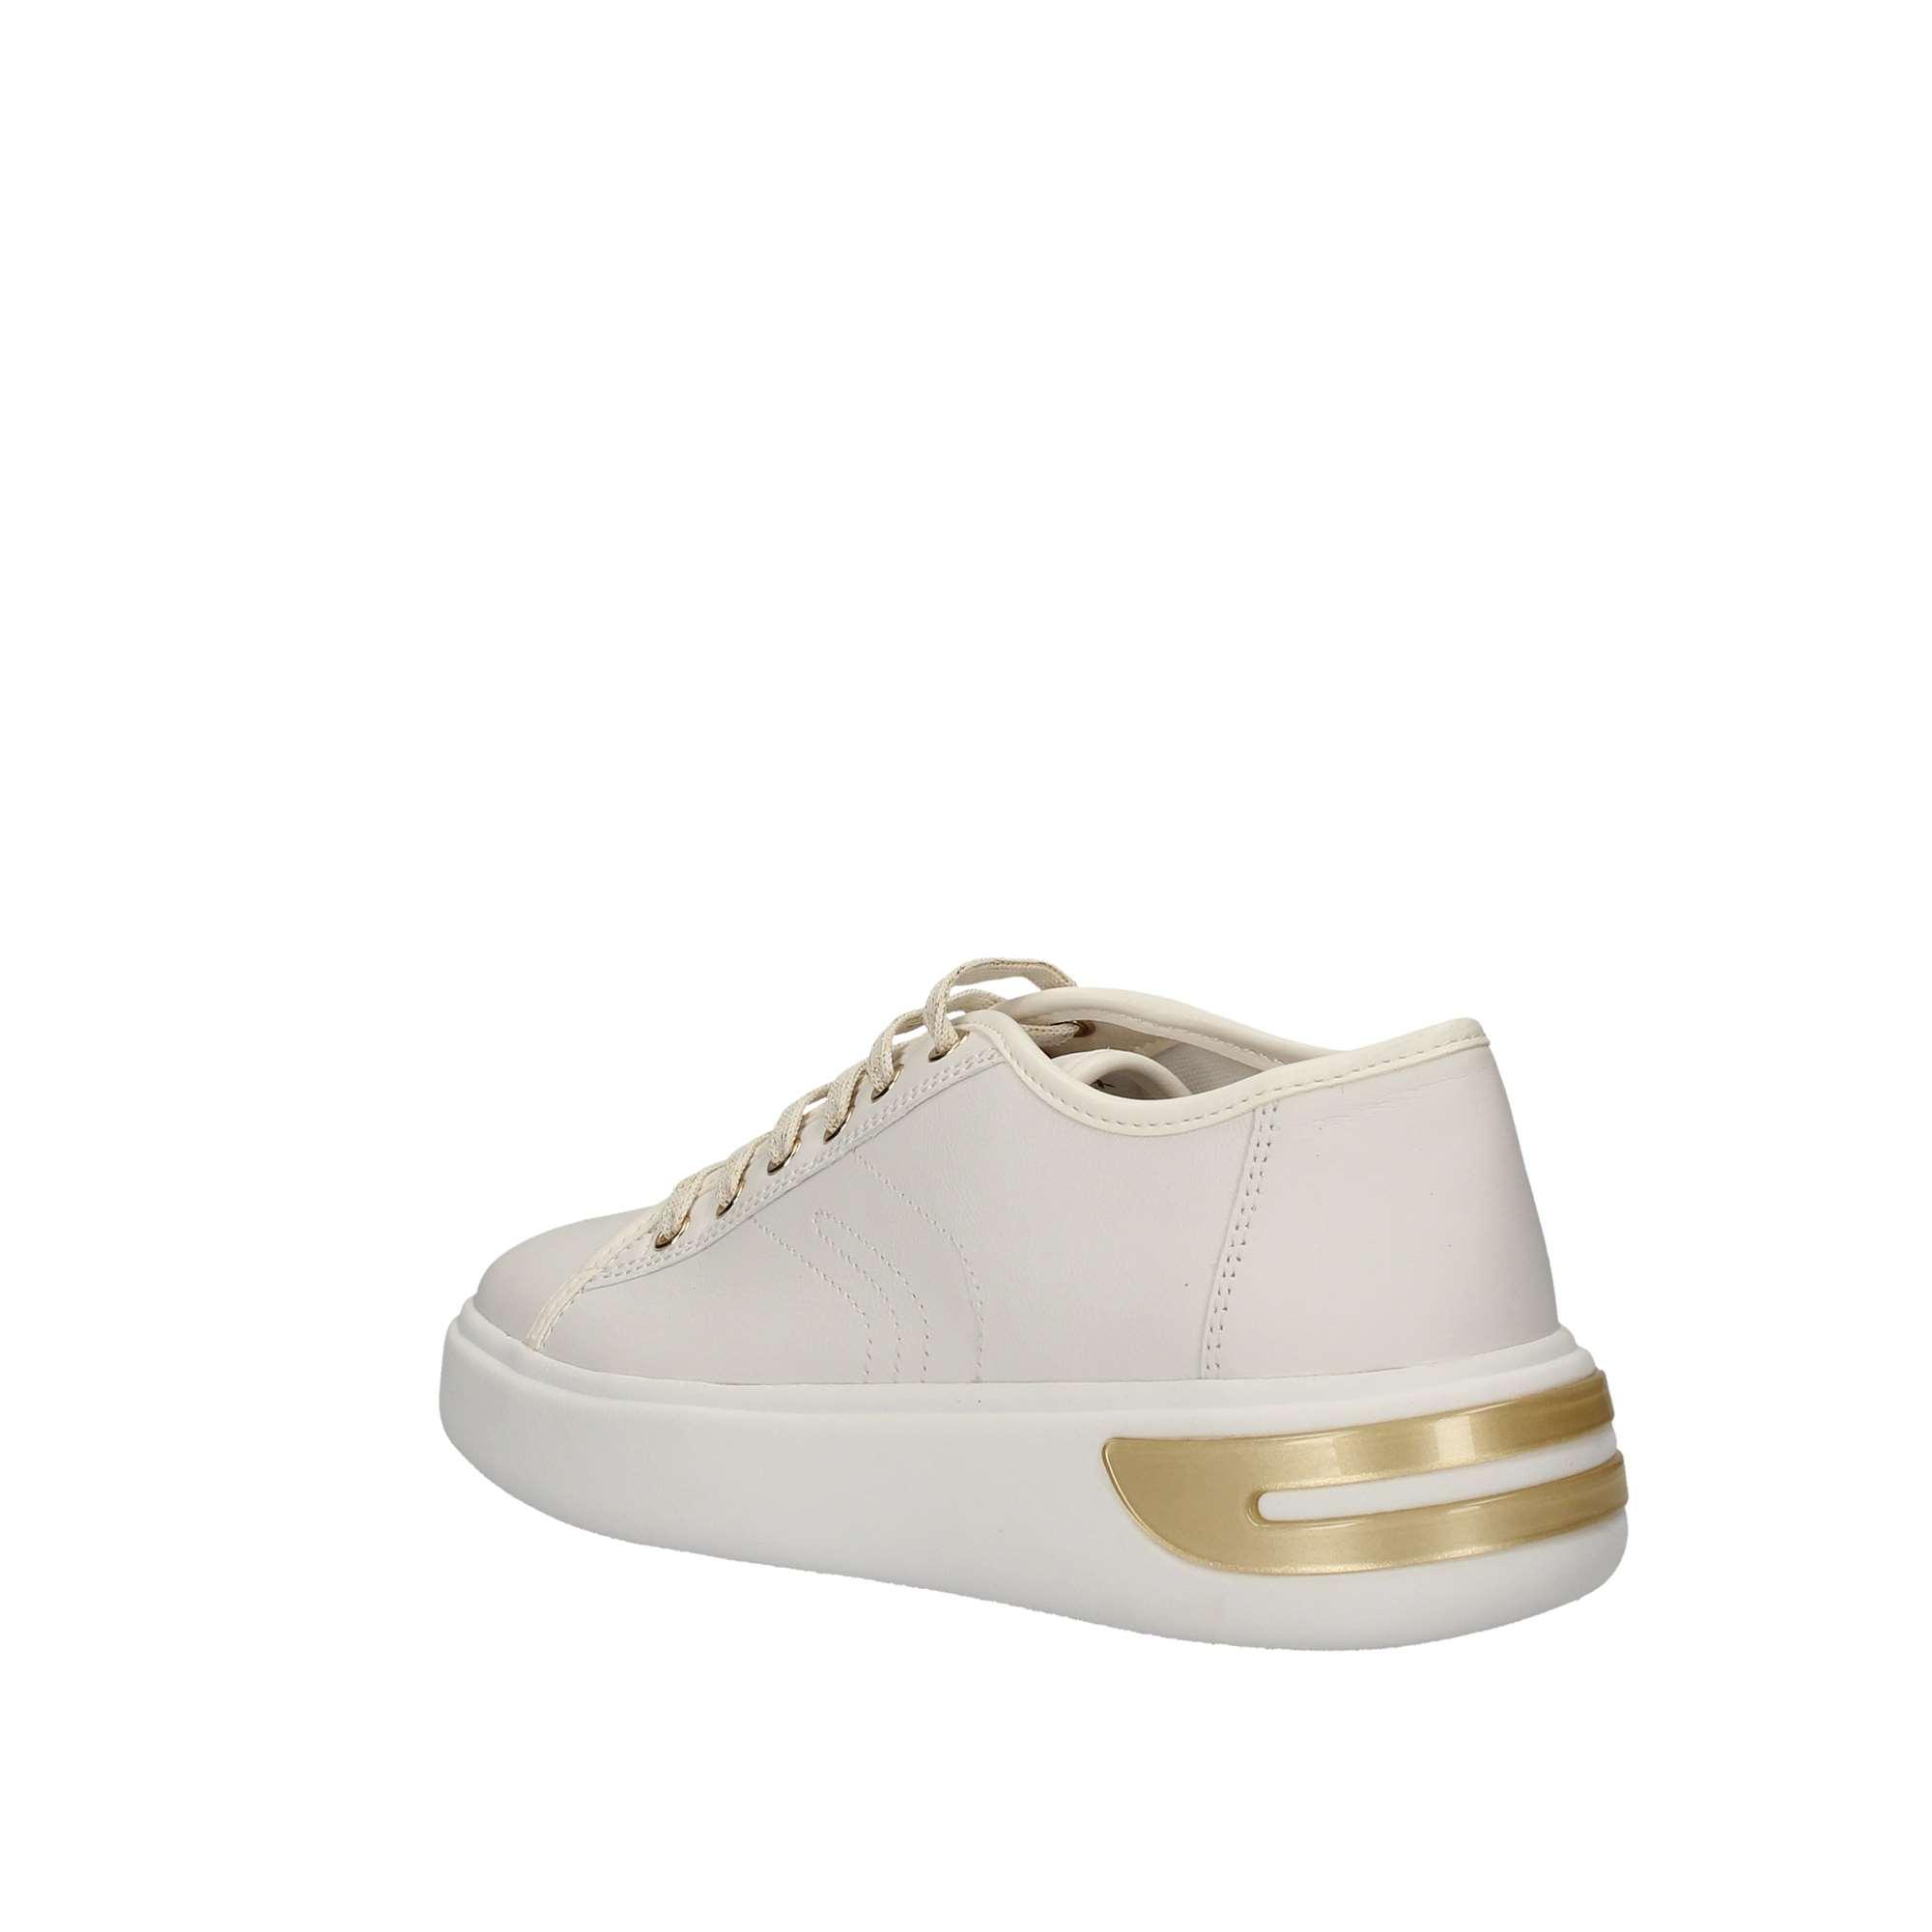 Geox Sneakers Donna D92BYA 00085 | Acquista ora su